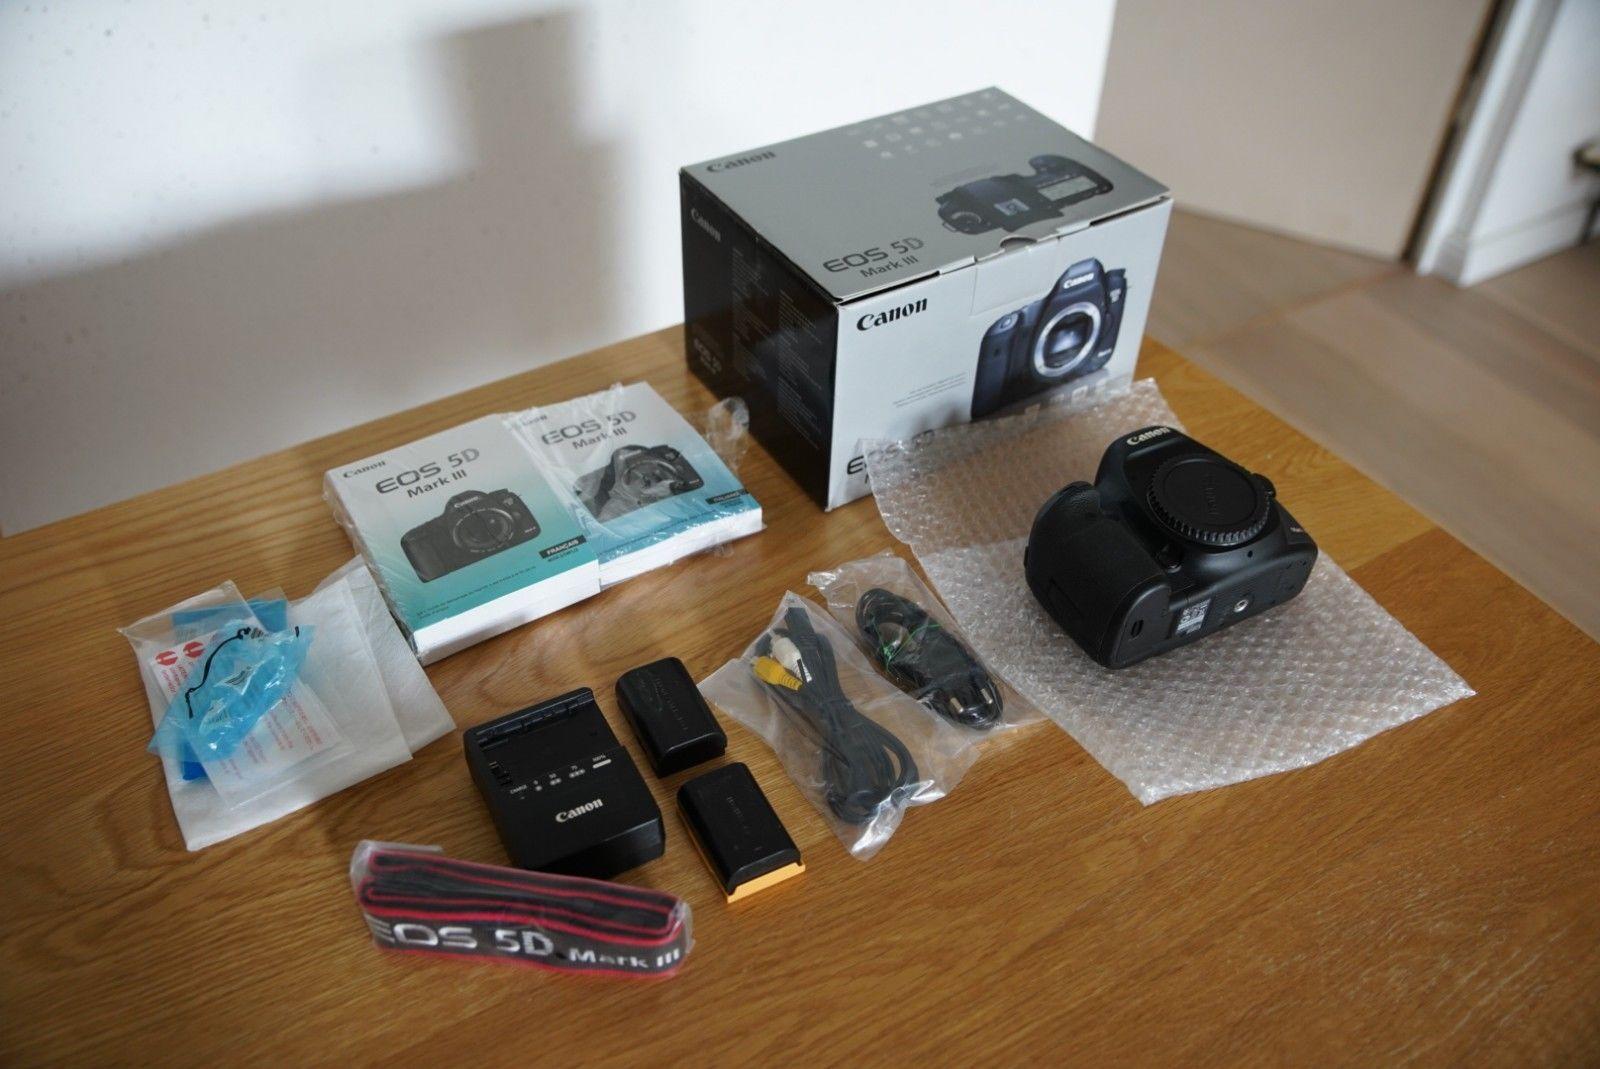 Canon EOS 5D Mark III Body, perfekter Zustand nur17.825 Auslösungen